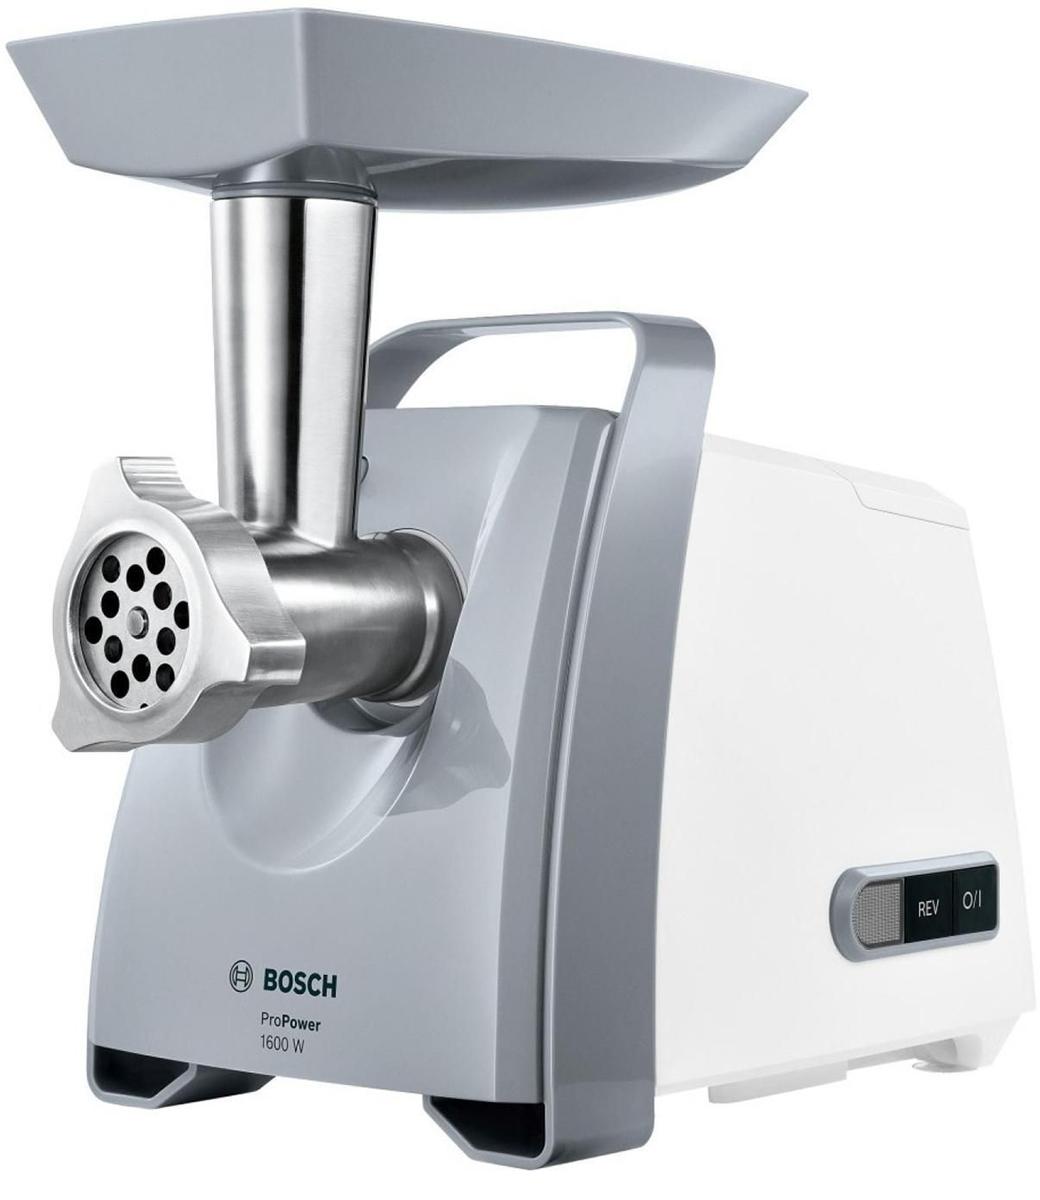 Zakazat.ru: Bosch MFW45020 ProPower, White Silver мясорубка